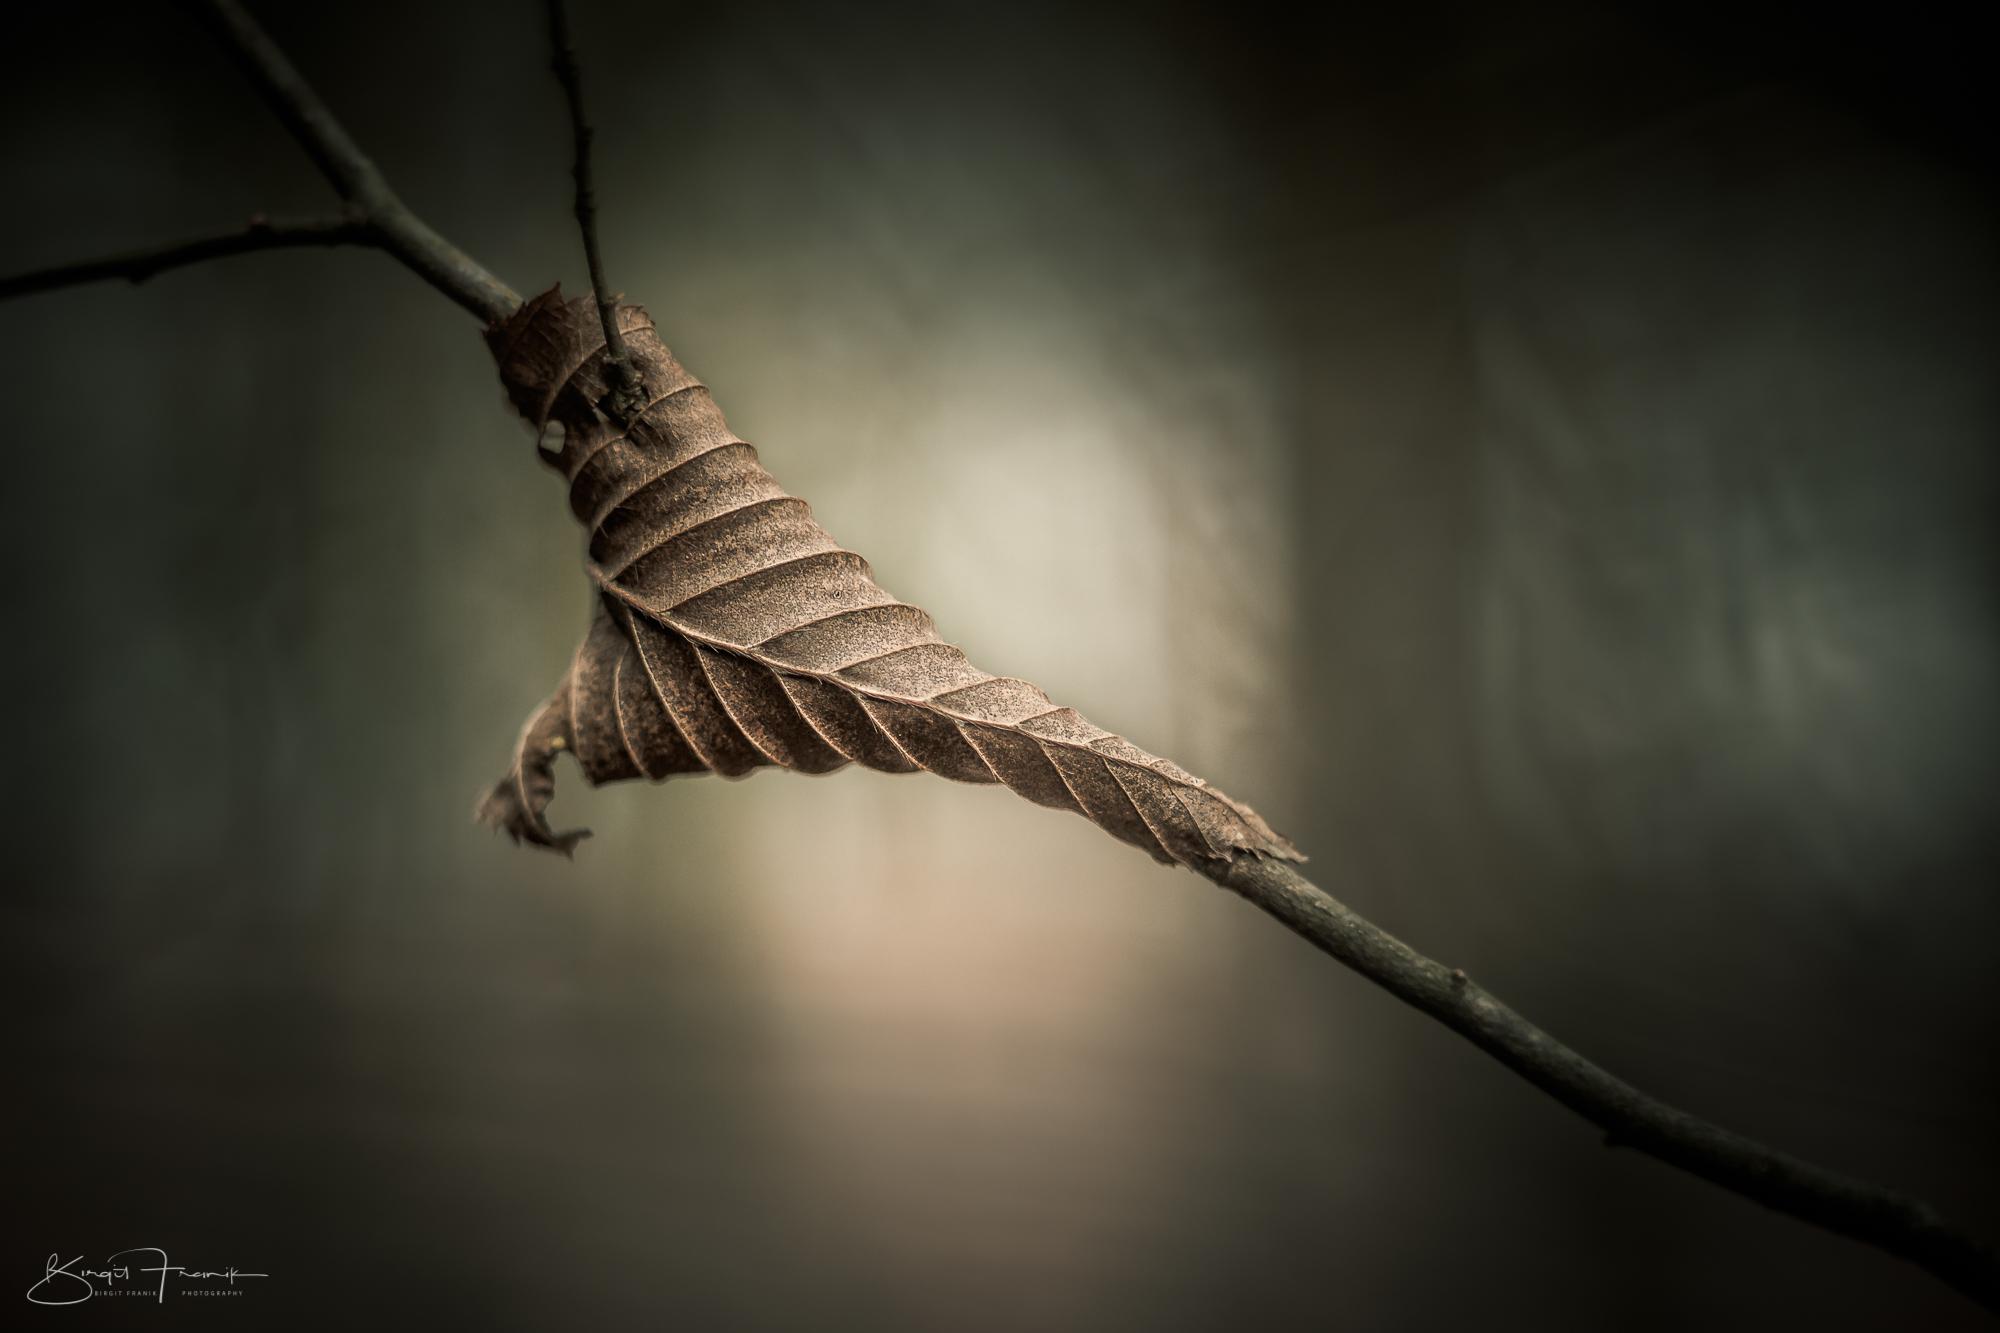 Old leaves